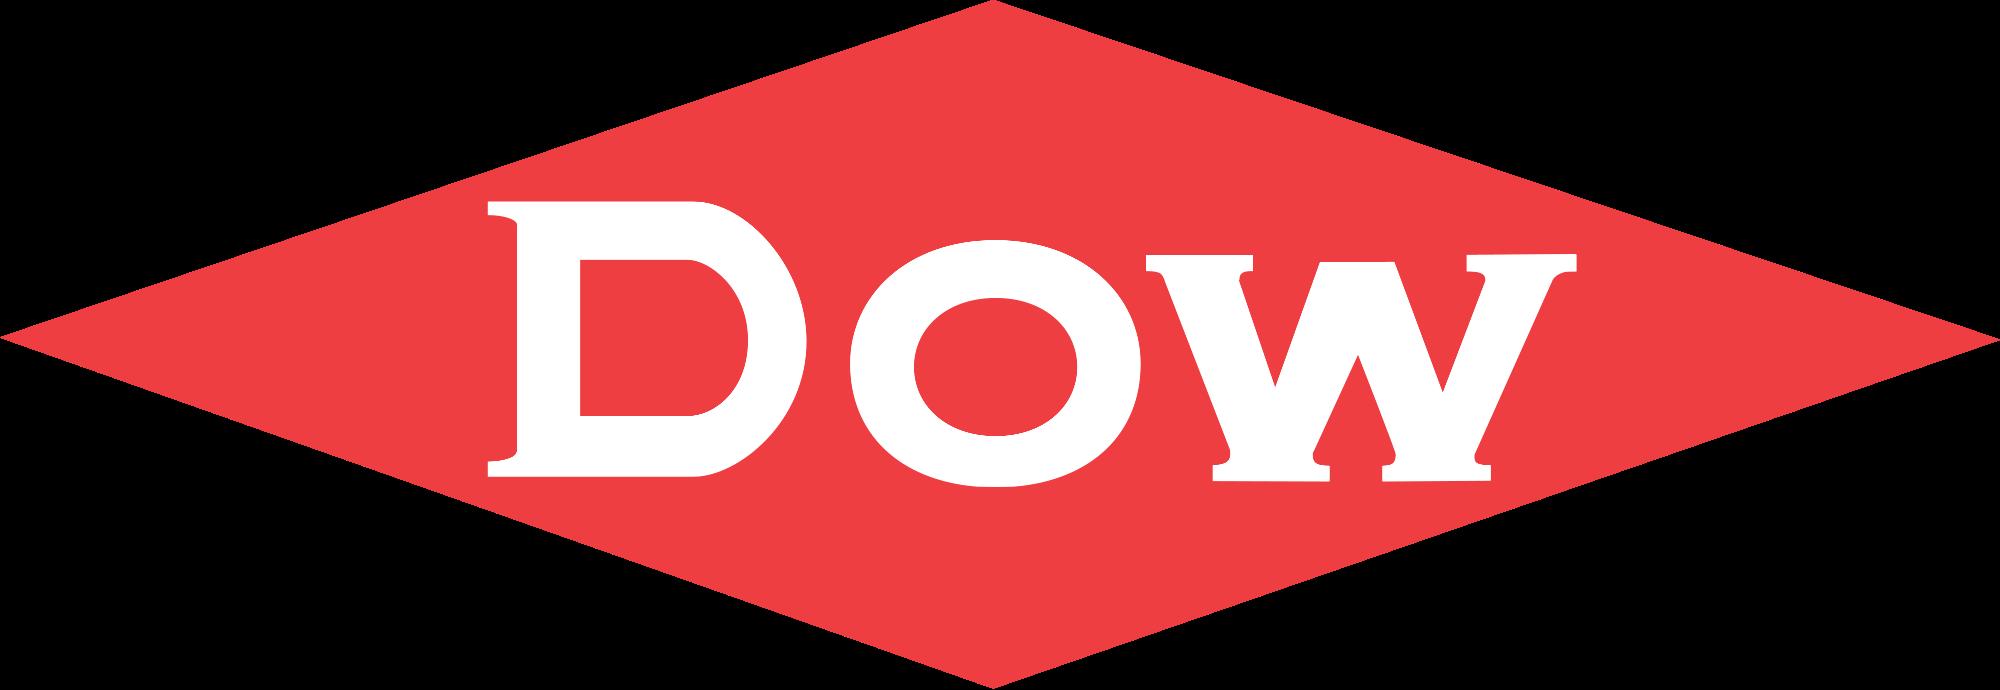 Dow_Chemical_Company_logo